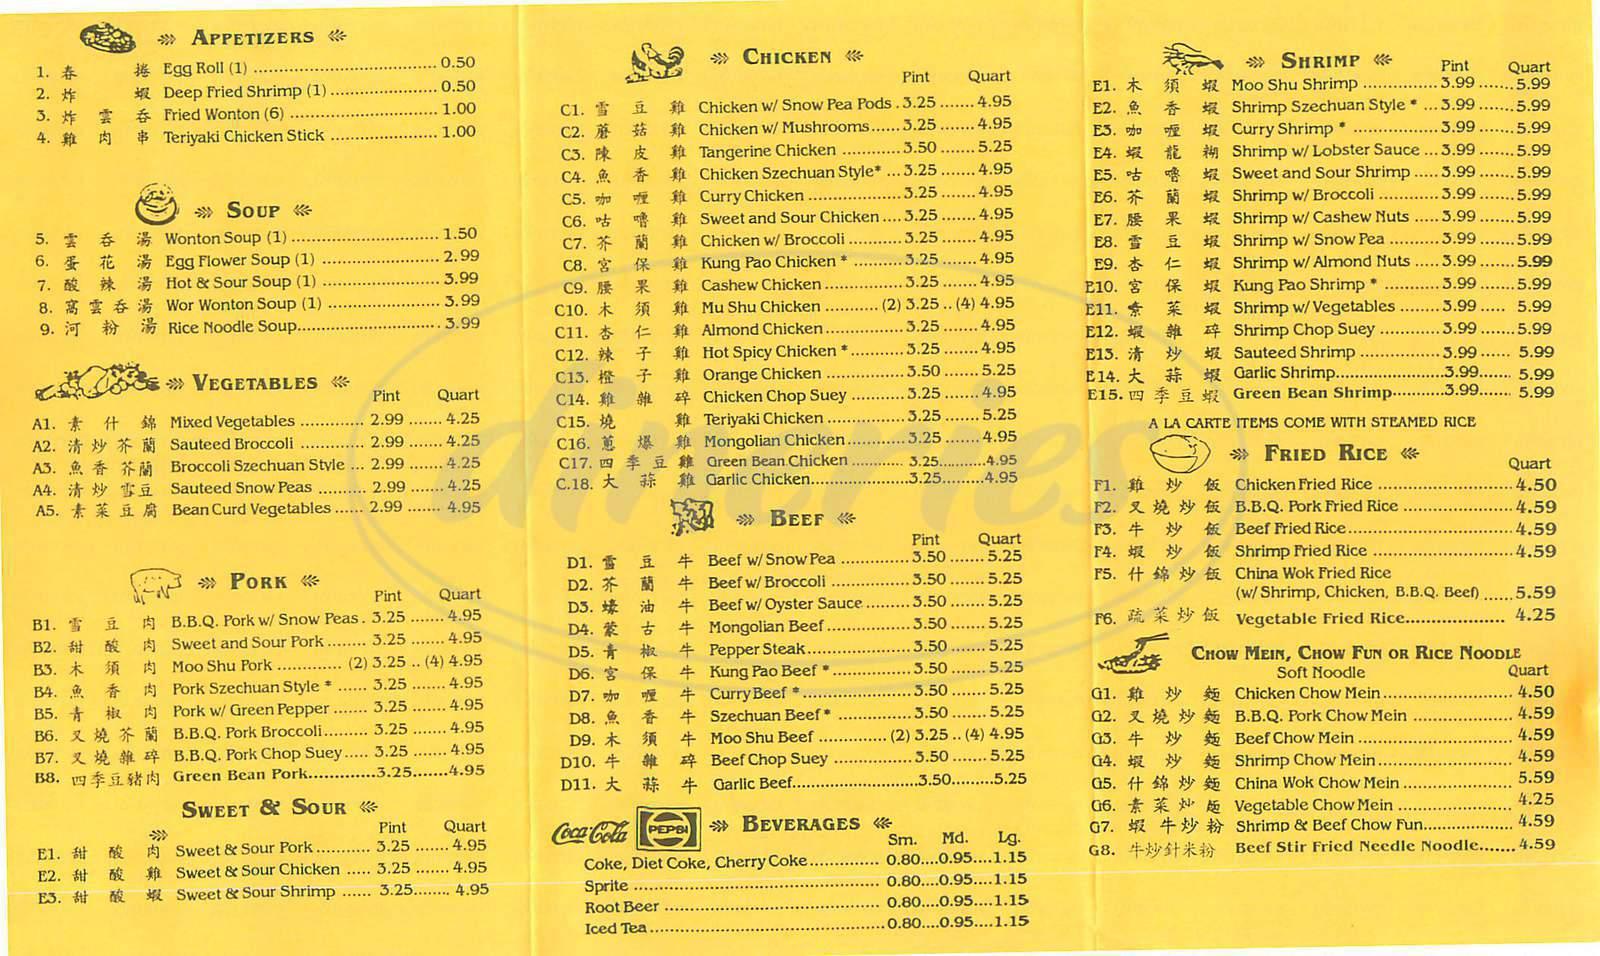 menu for China Wok